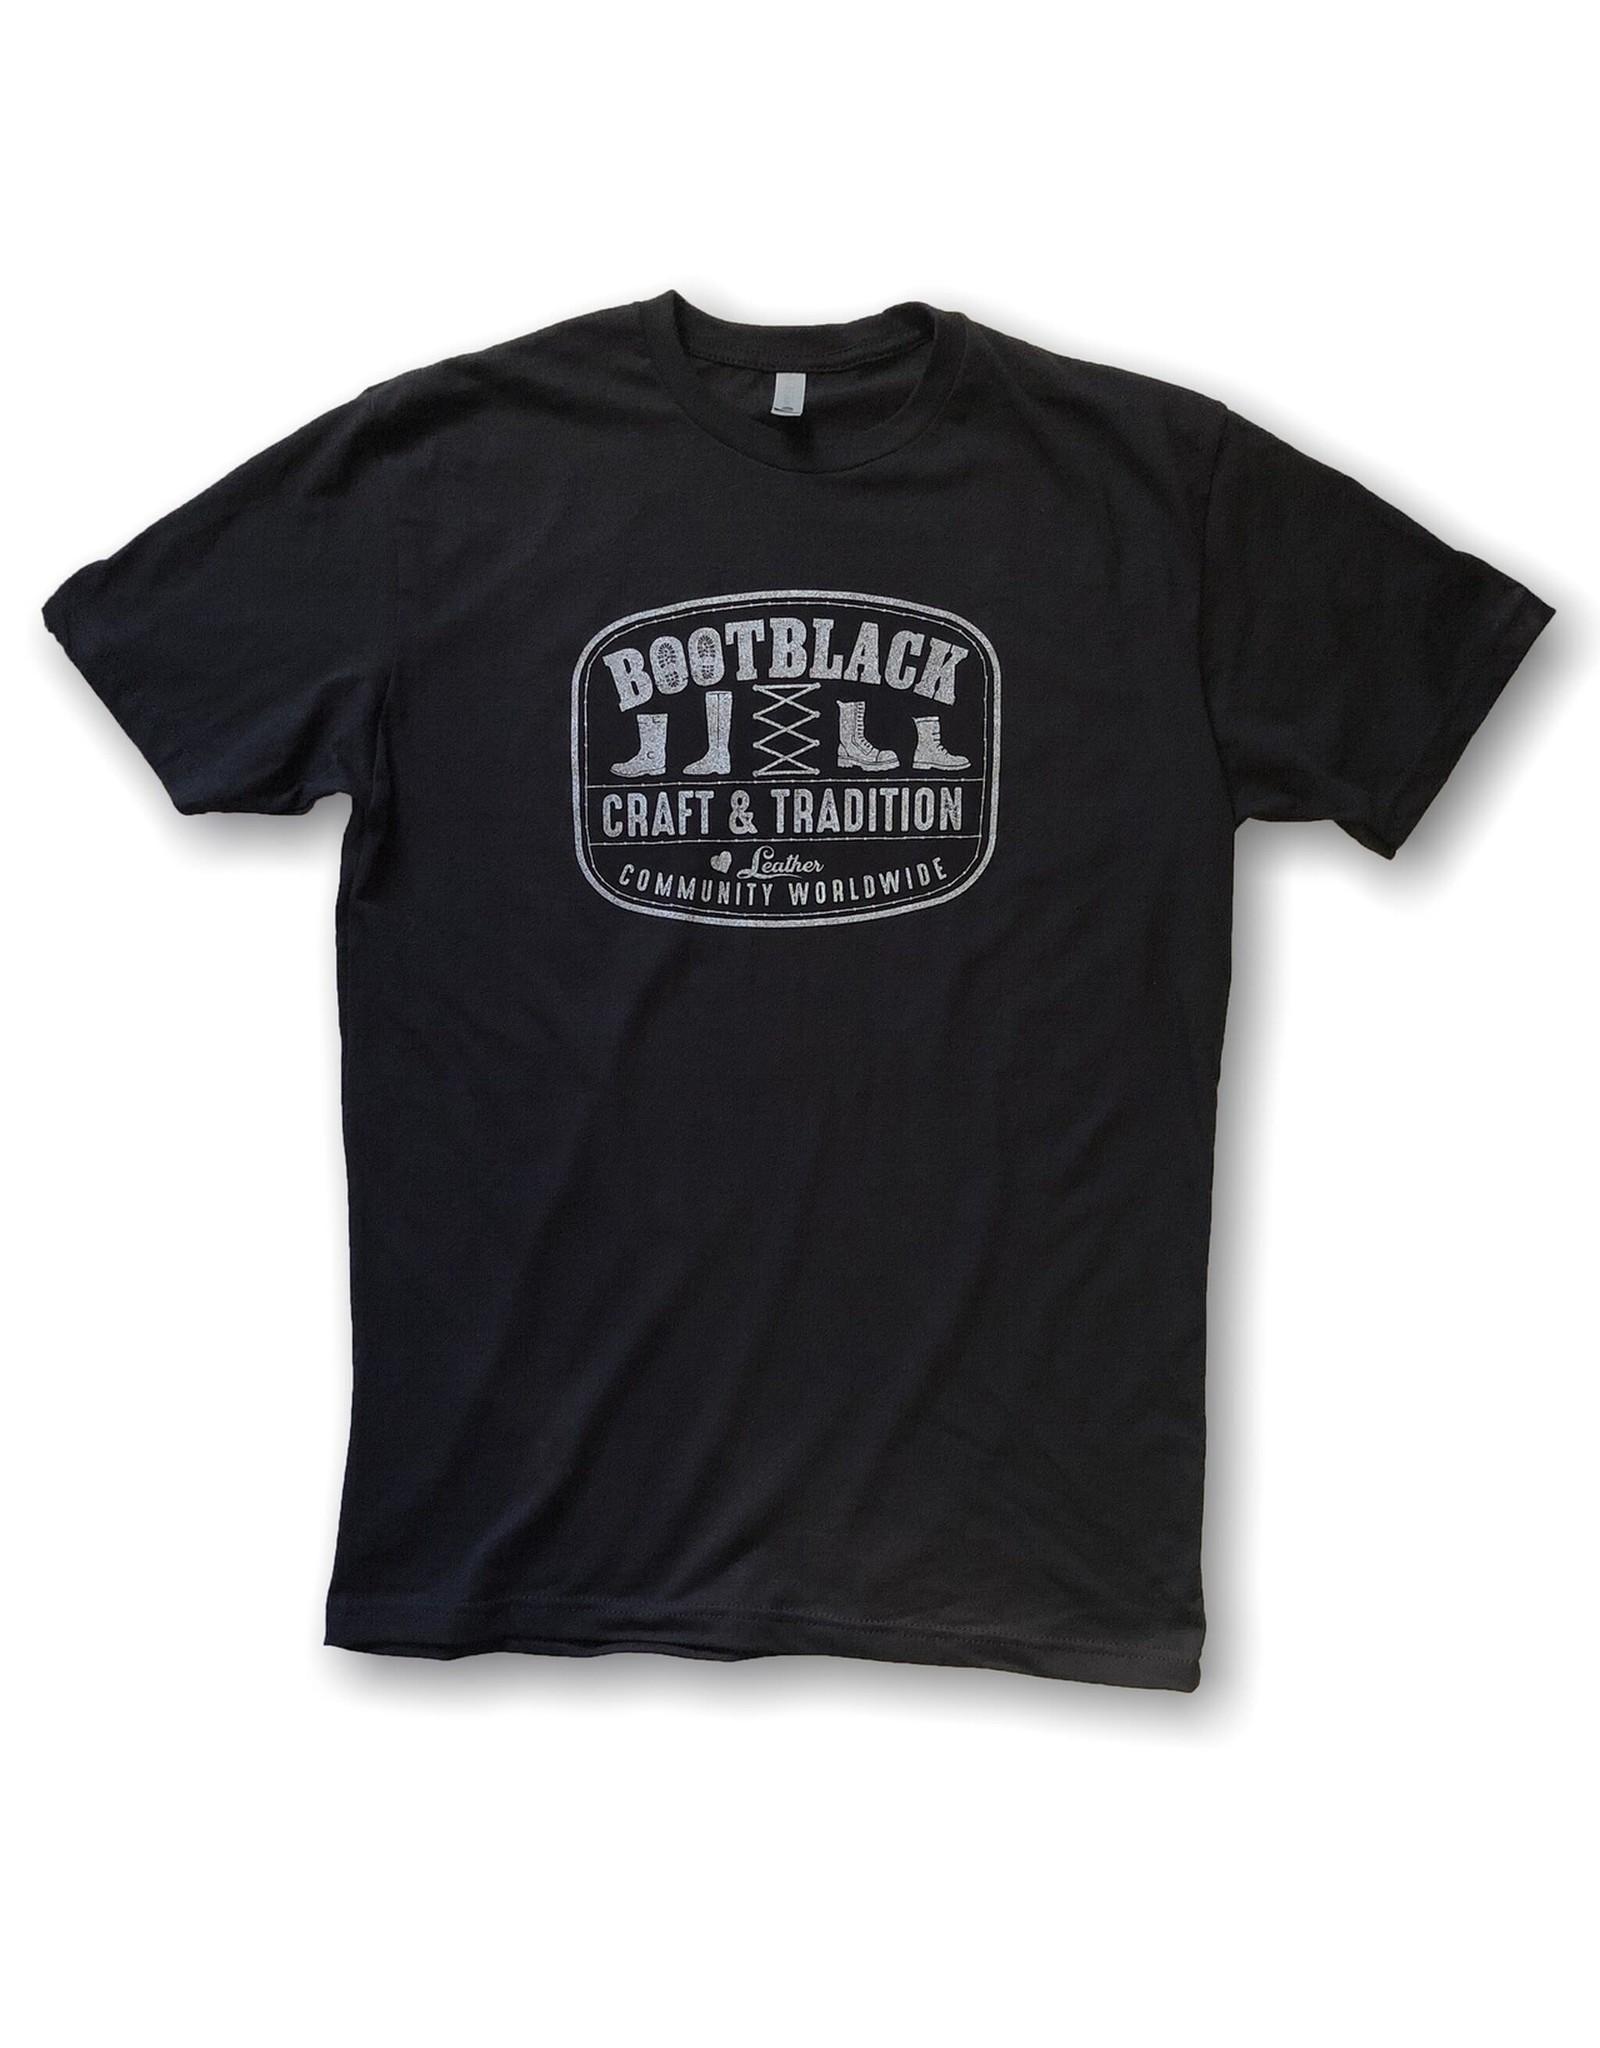 Shane Ruff Studio Burley Tees Bootblack Shirt